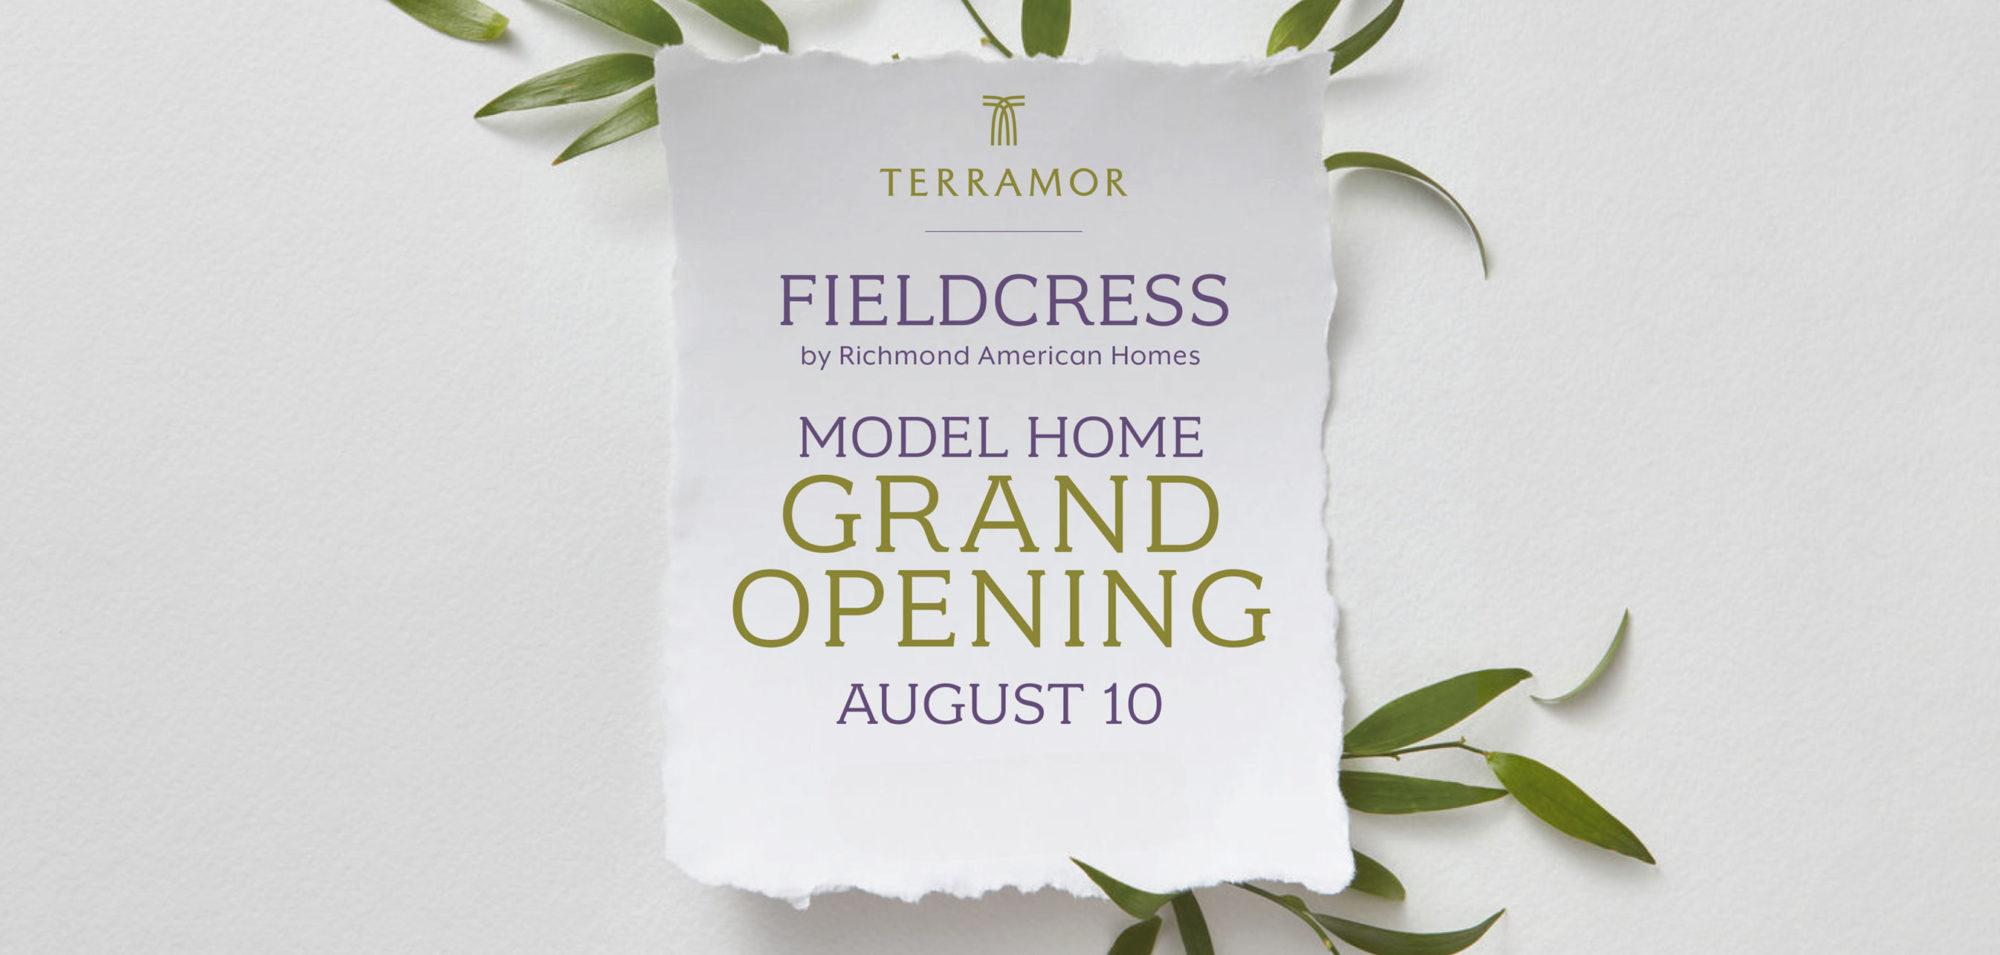 Fieldcress Model Home Grand Opening - August 10